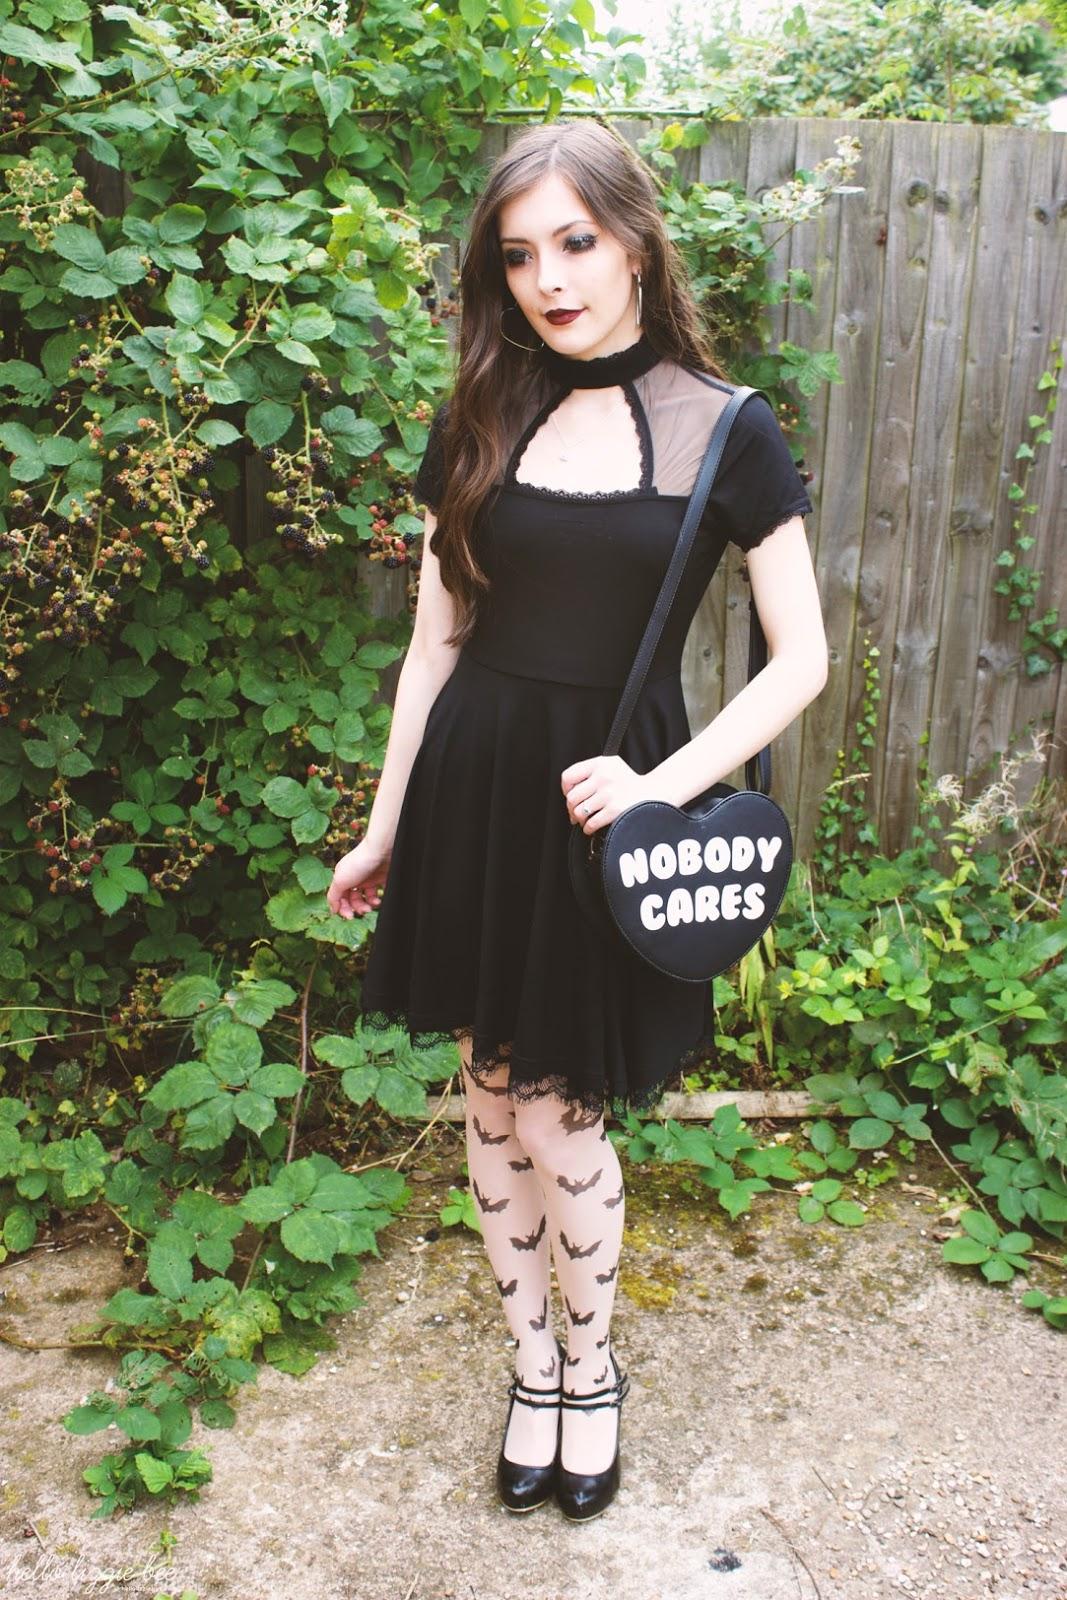 nu goth, alternative girl